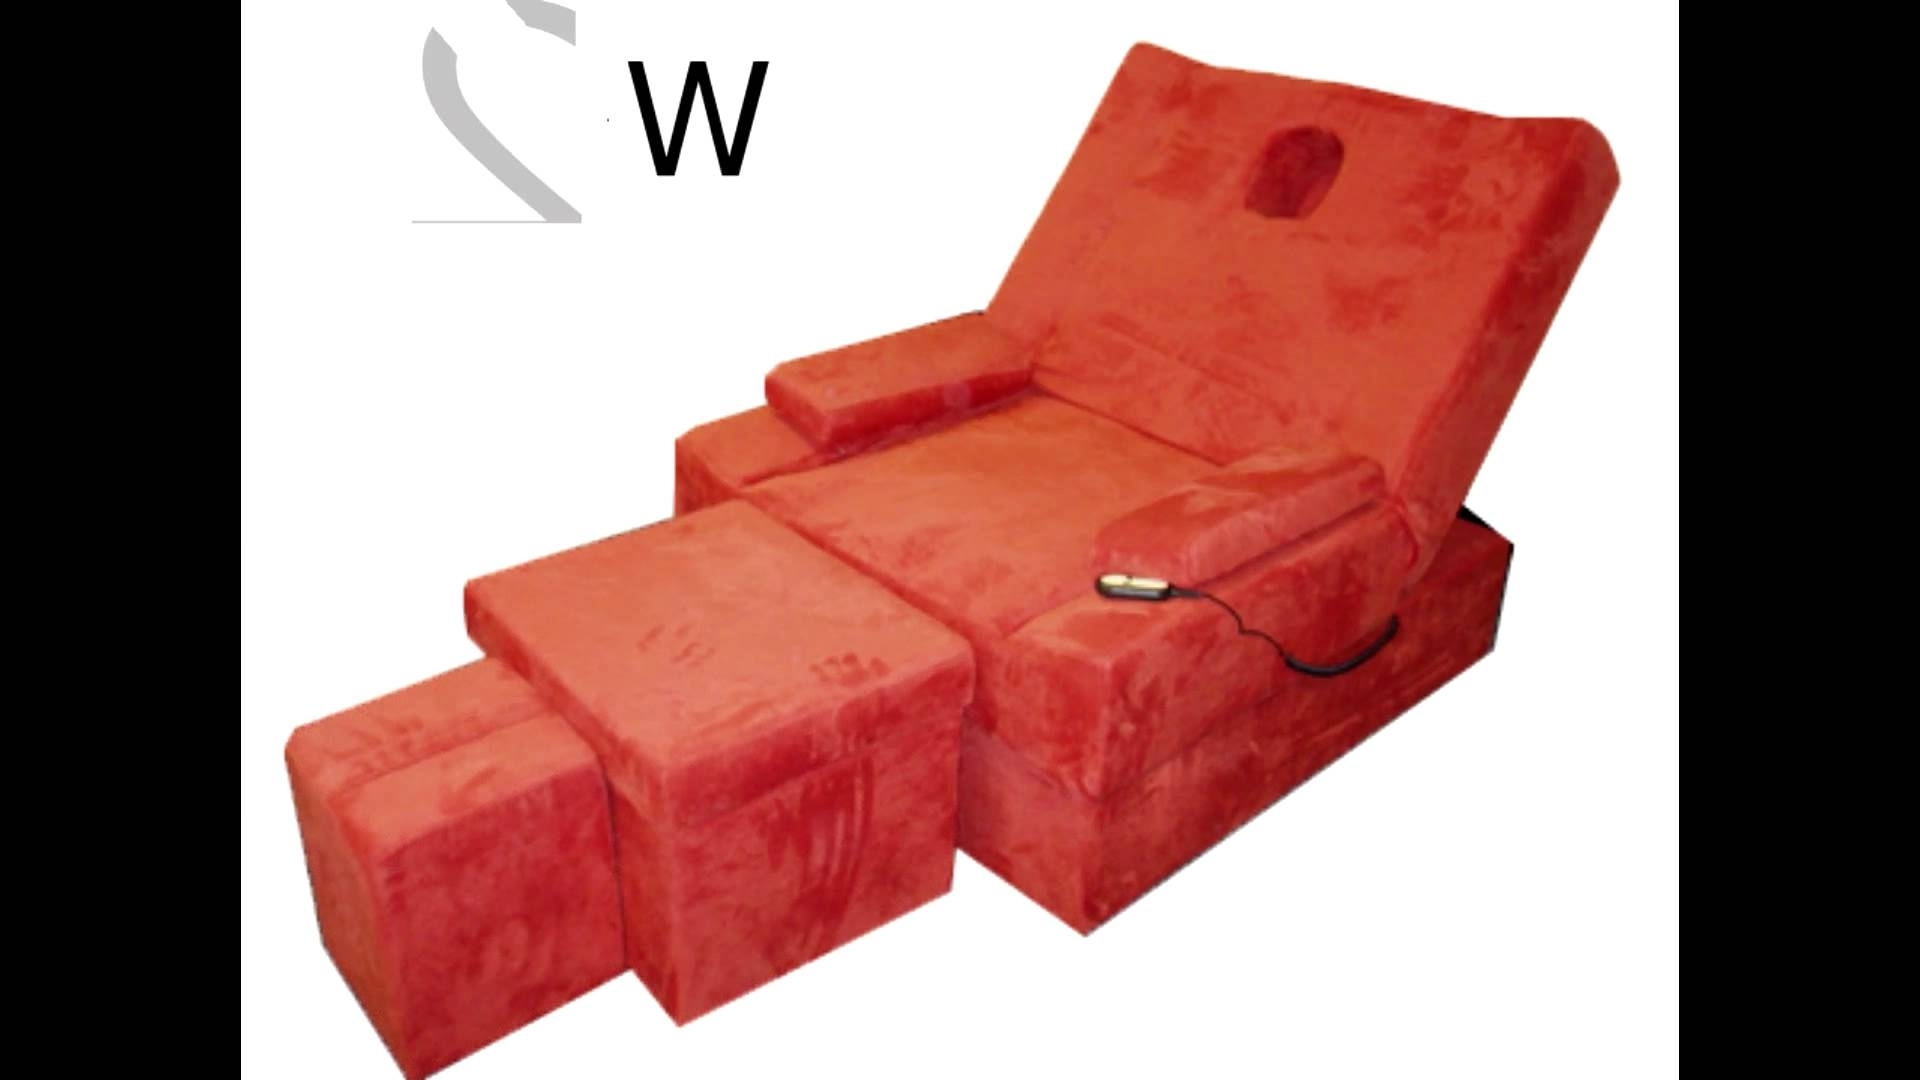 2017 Electric Foot Massage Sofa Set 电动足浴沙发  Youtube Regarding Foot Massage Sofas (View 13 of 15)